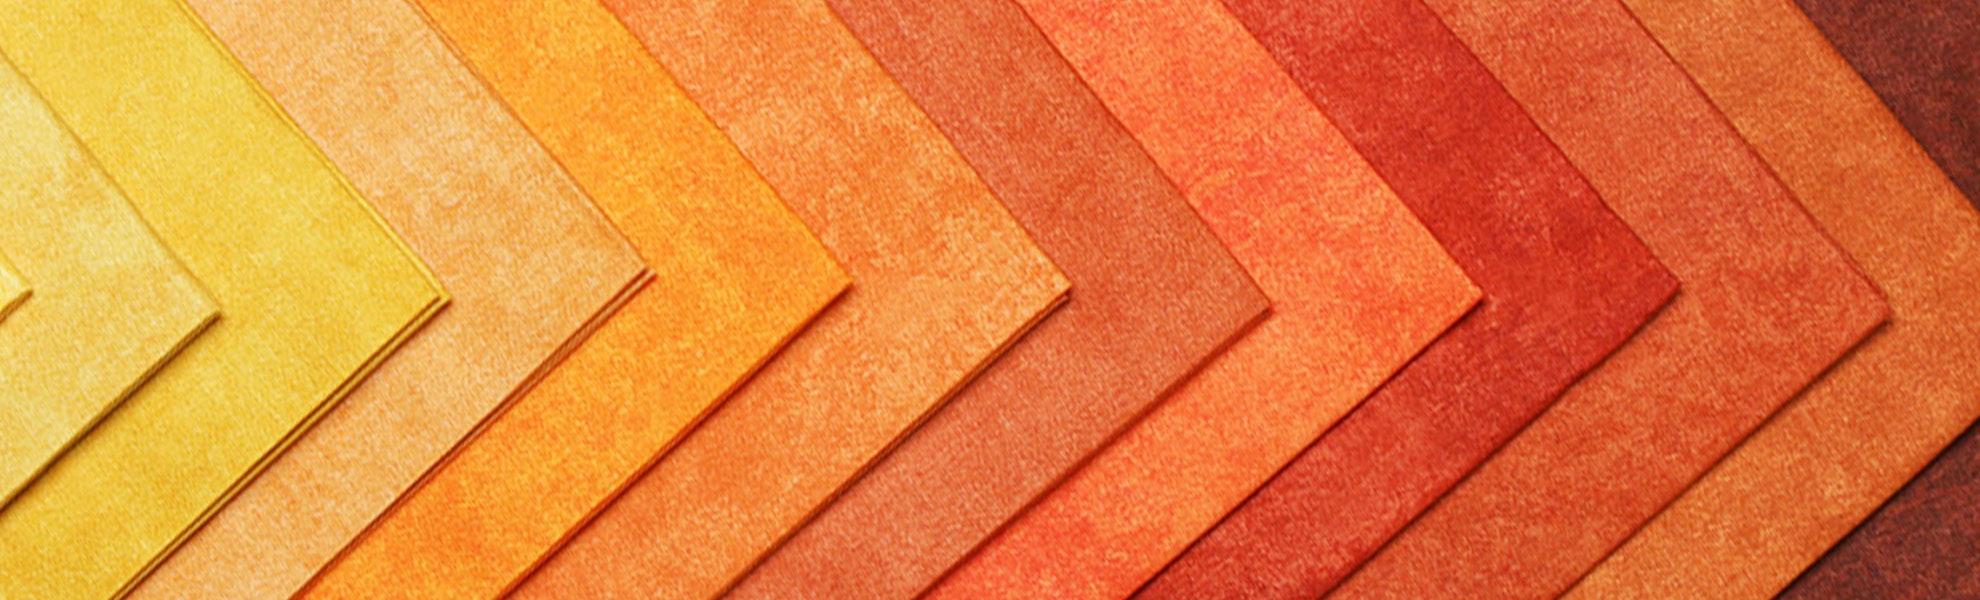 Monochromatic Fat Quarter Bundle by Maywood Studio